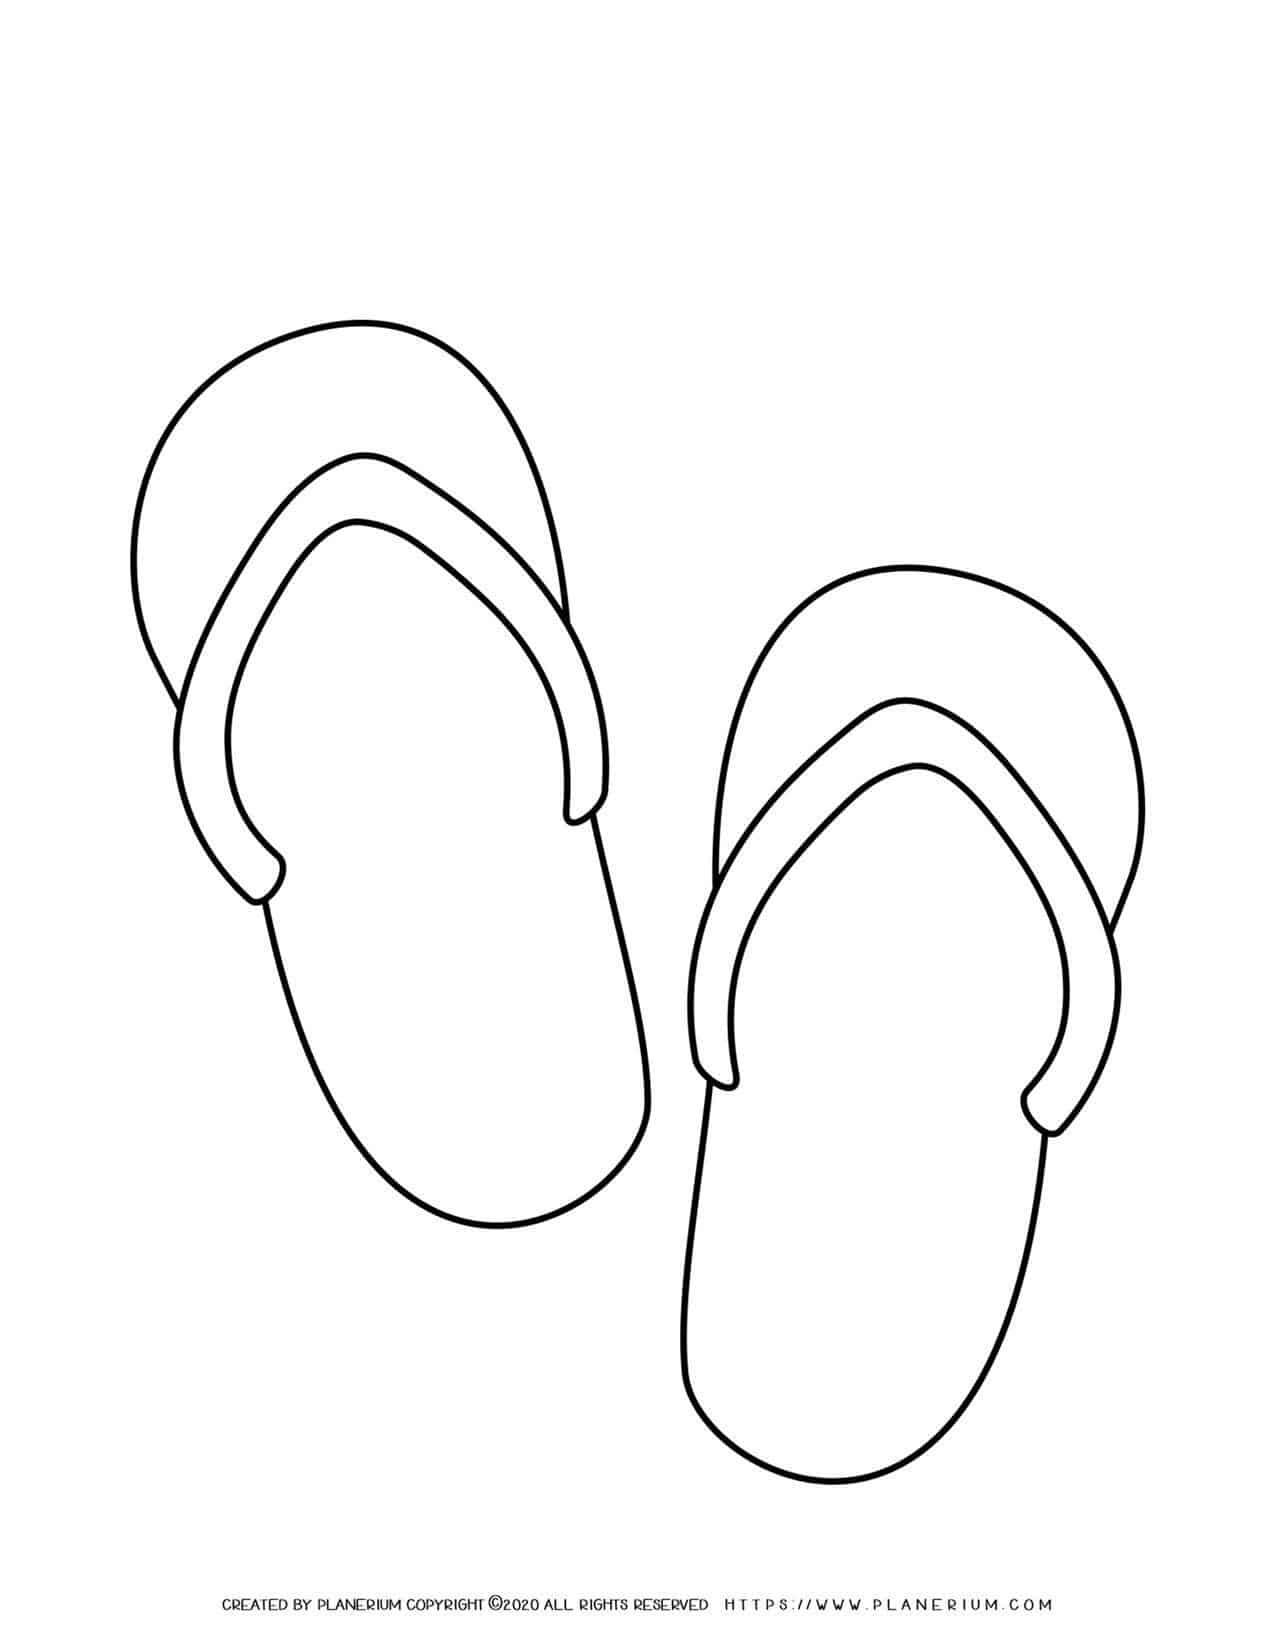 Flip Flops Outline | Planerium